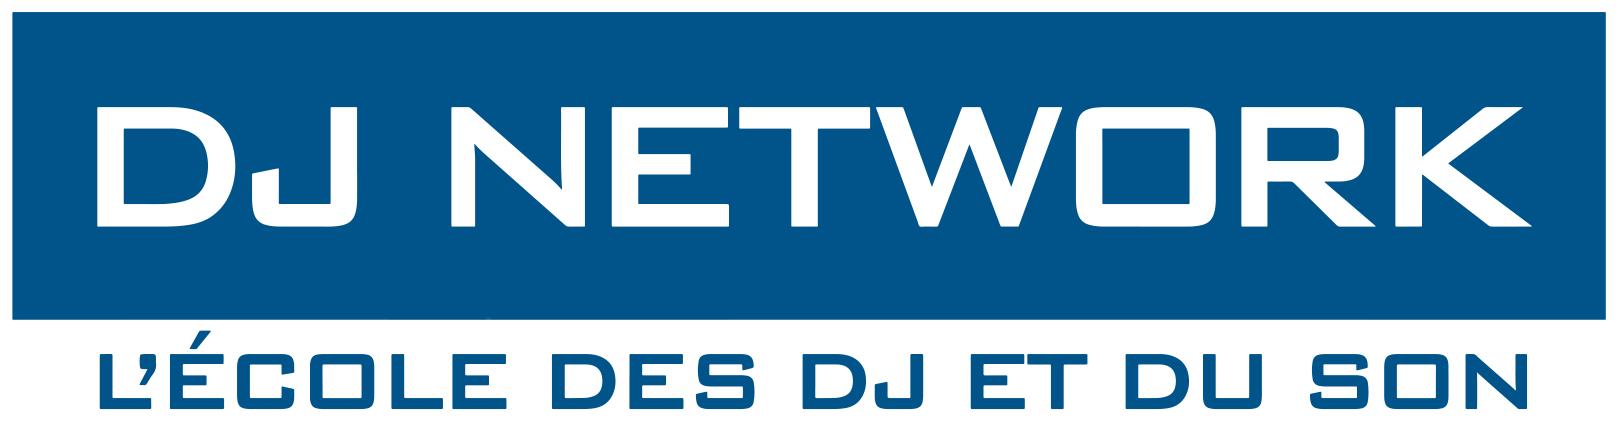 LOGO DJ NETWORK 2015